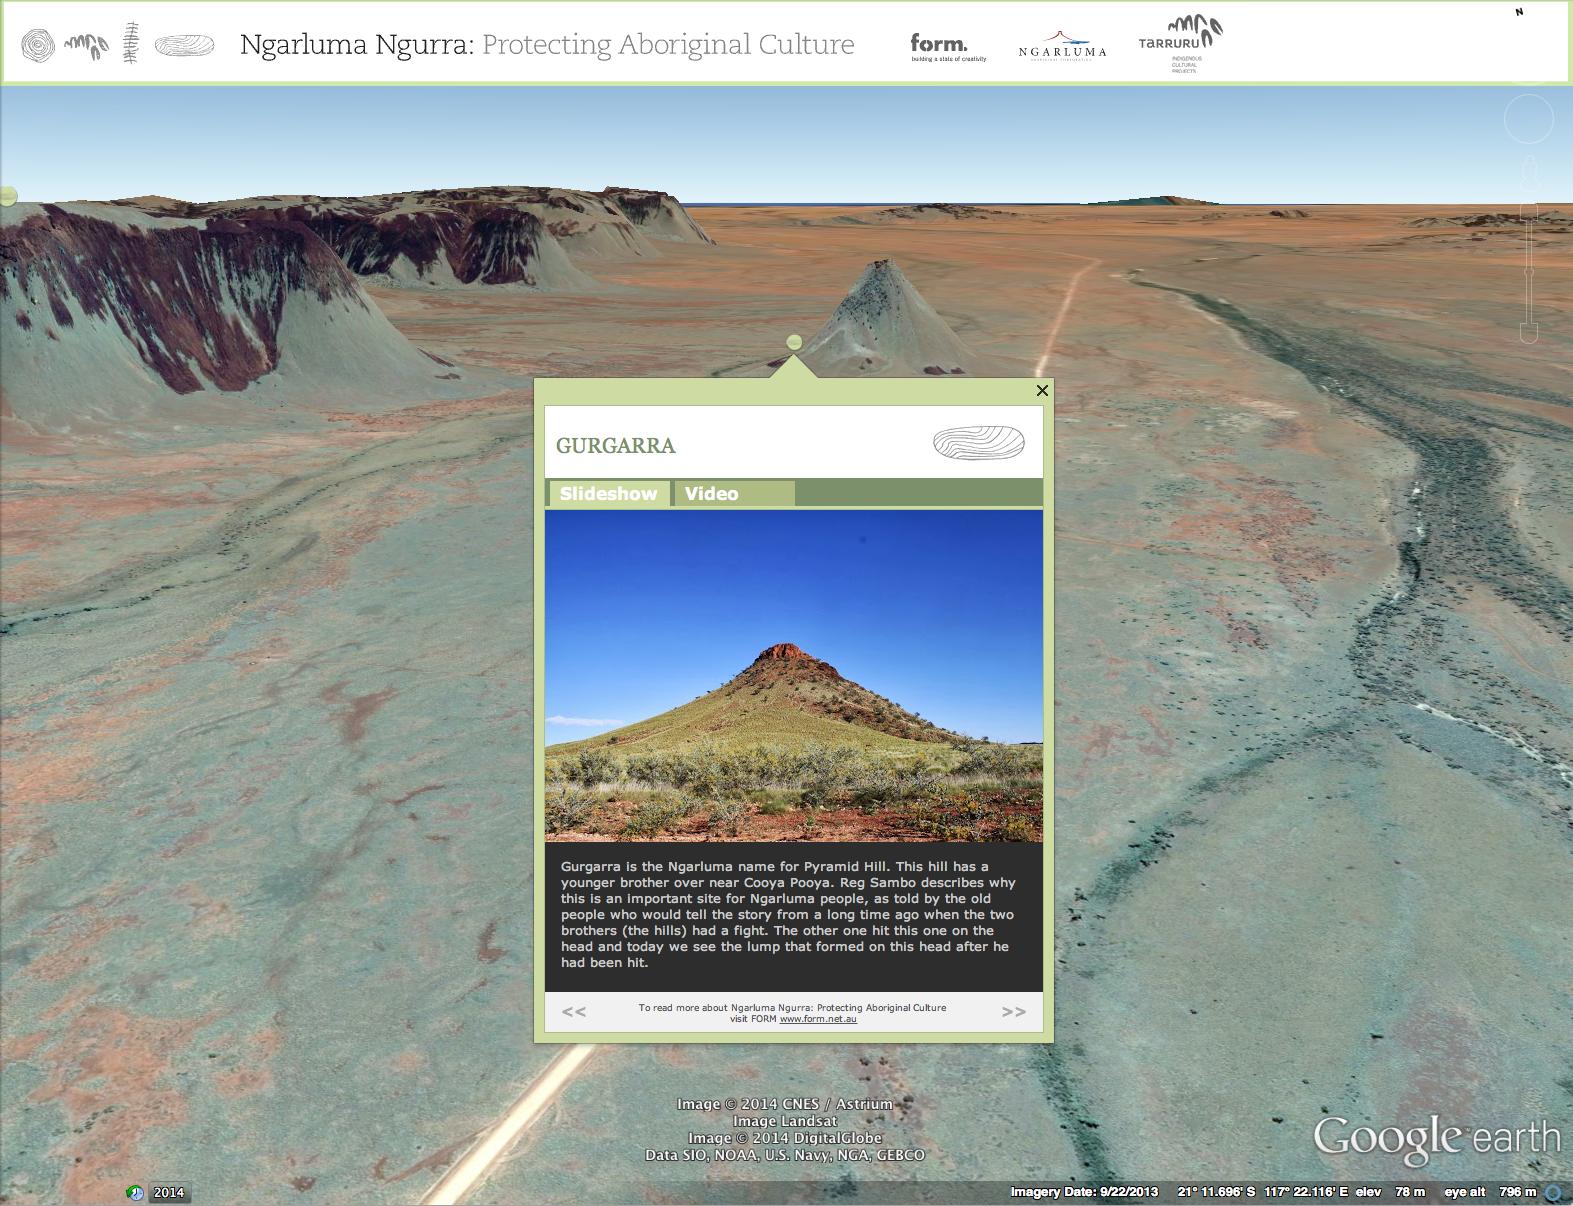 Cultural Mapping - Image: Ngarluma Ngurra 2014